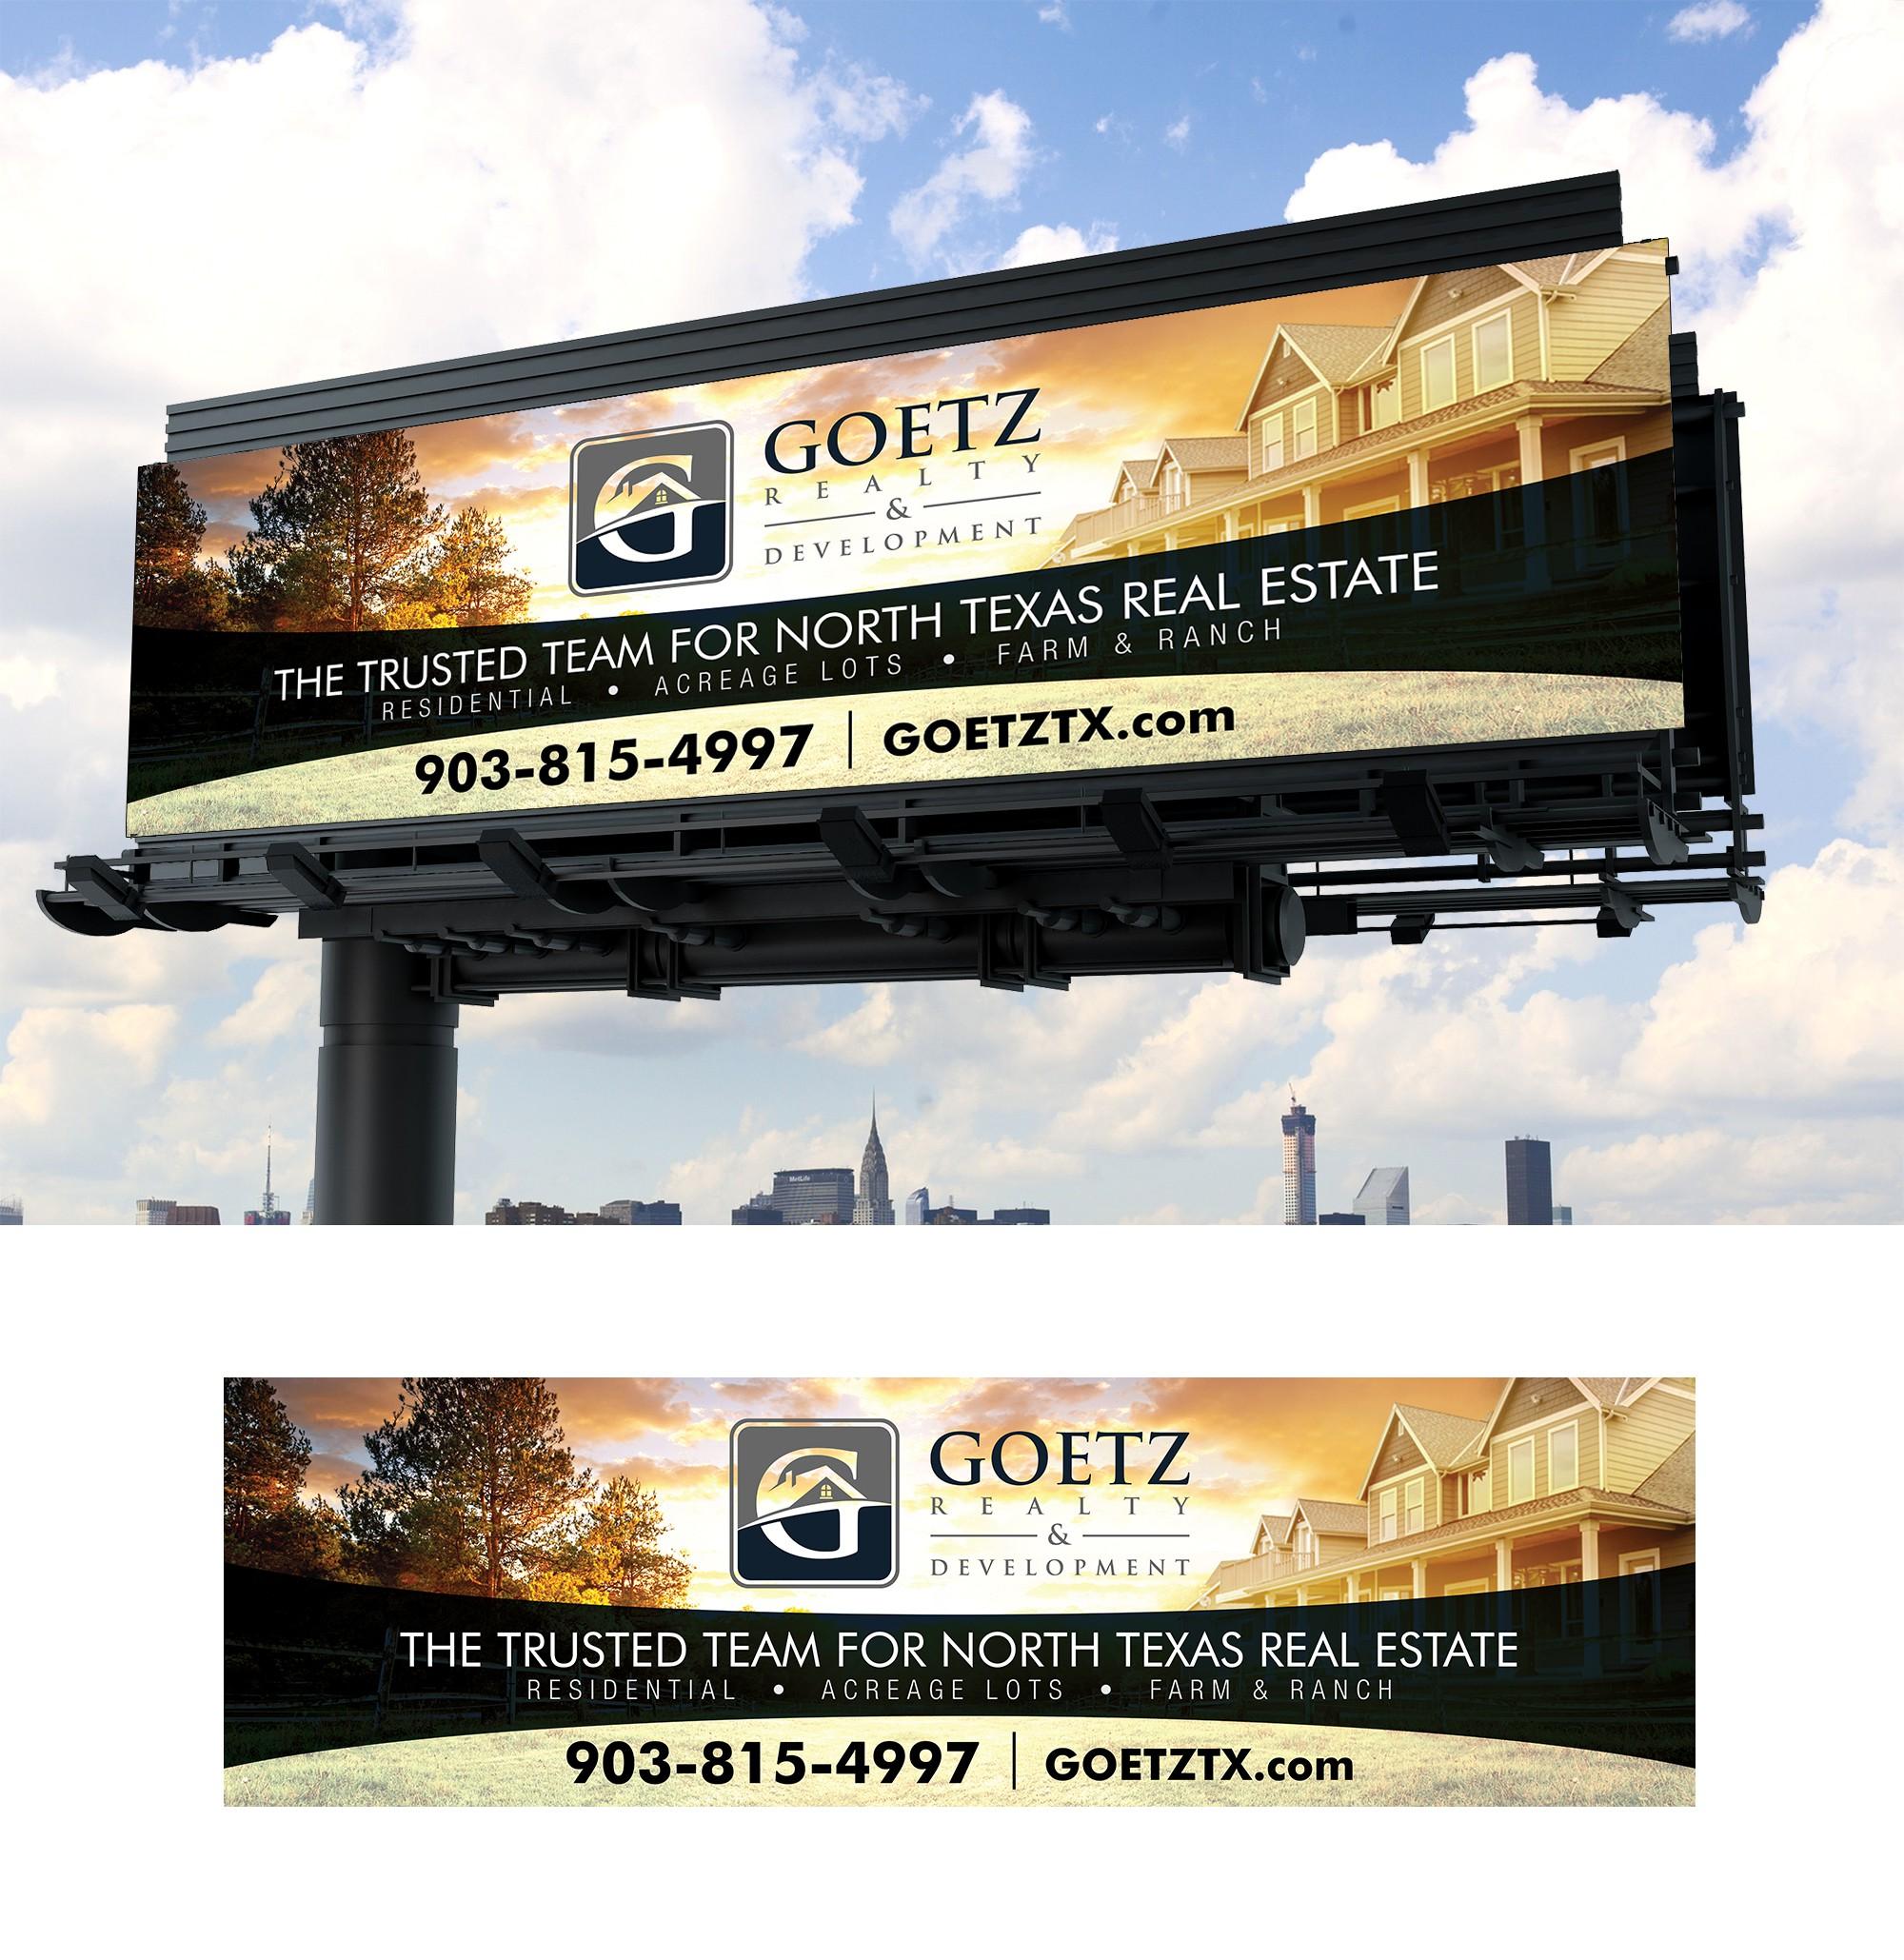 Classy & Bold Billboard Design for Goetz Realty & Development